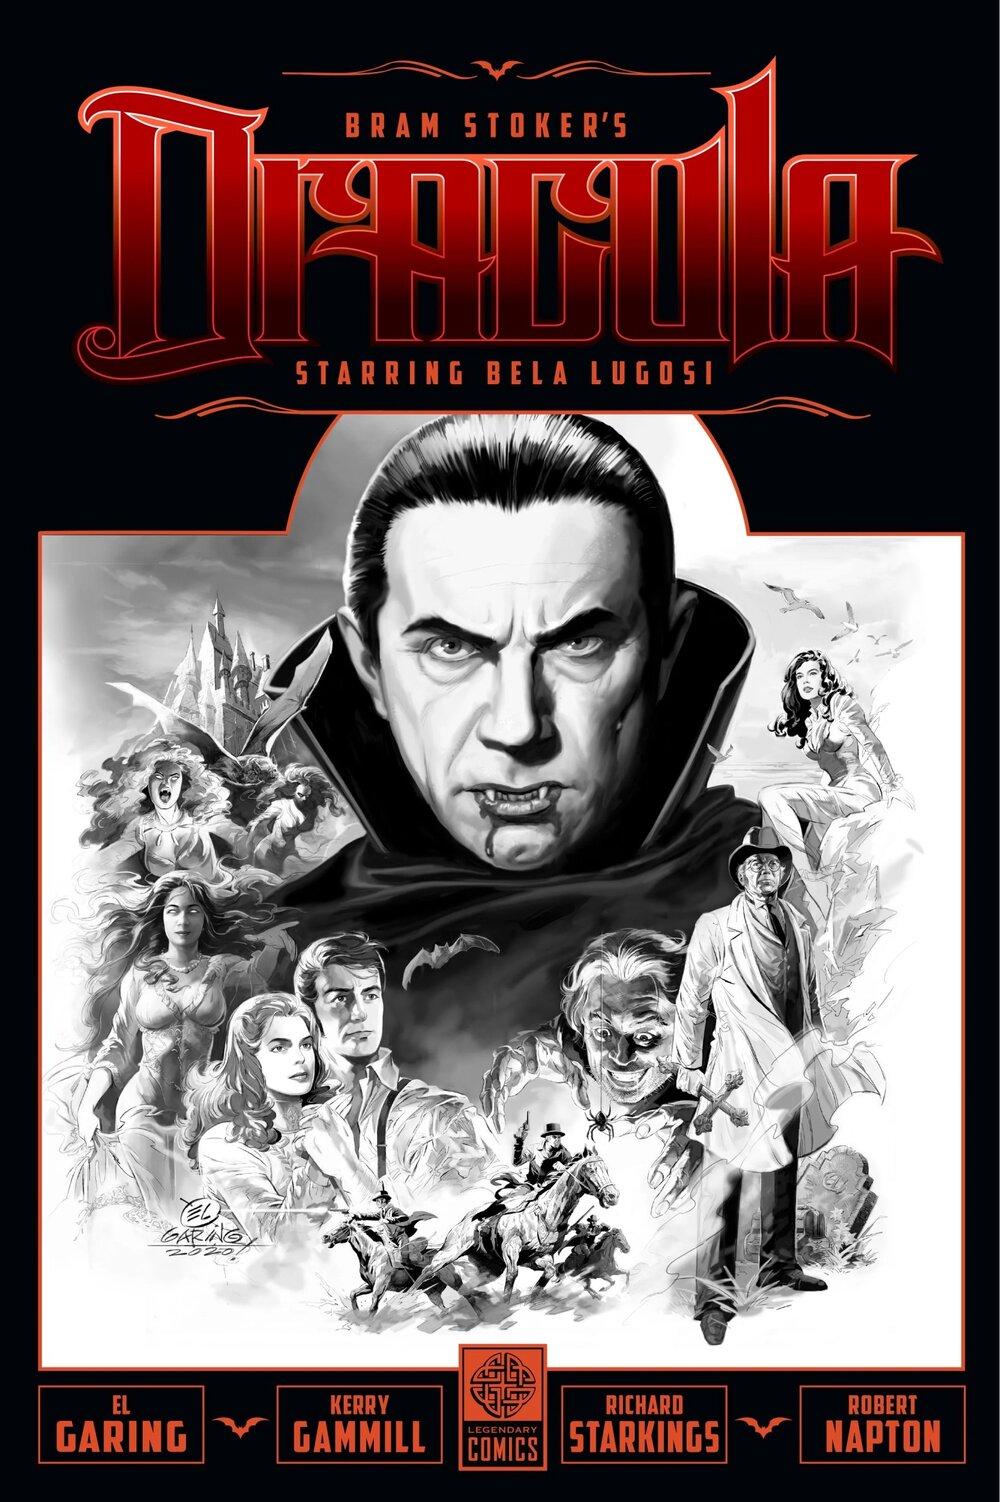 new-art-shared-for-legendary-comics-dracula-starring-bela-lugosi4